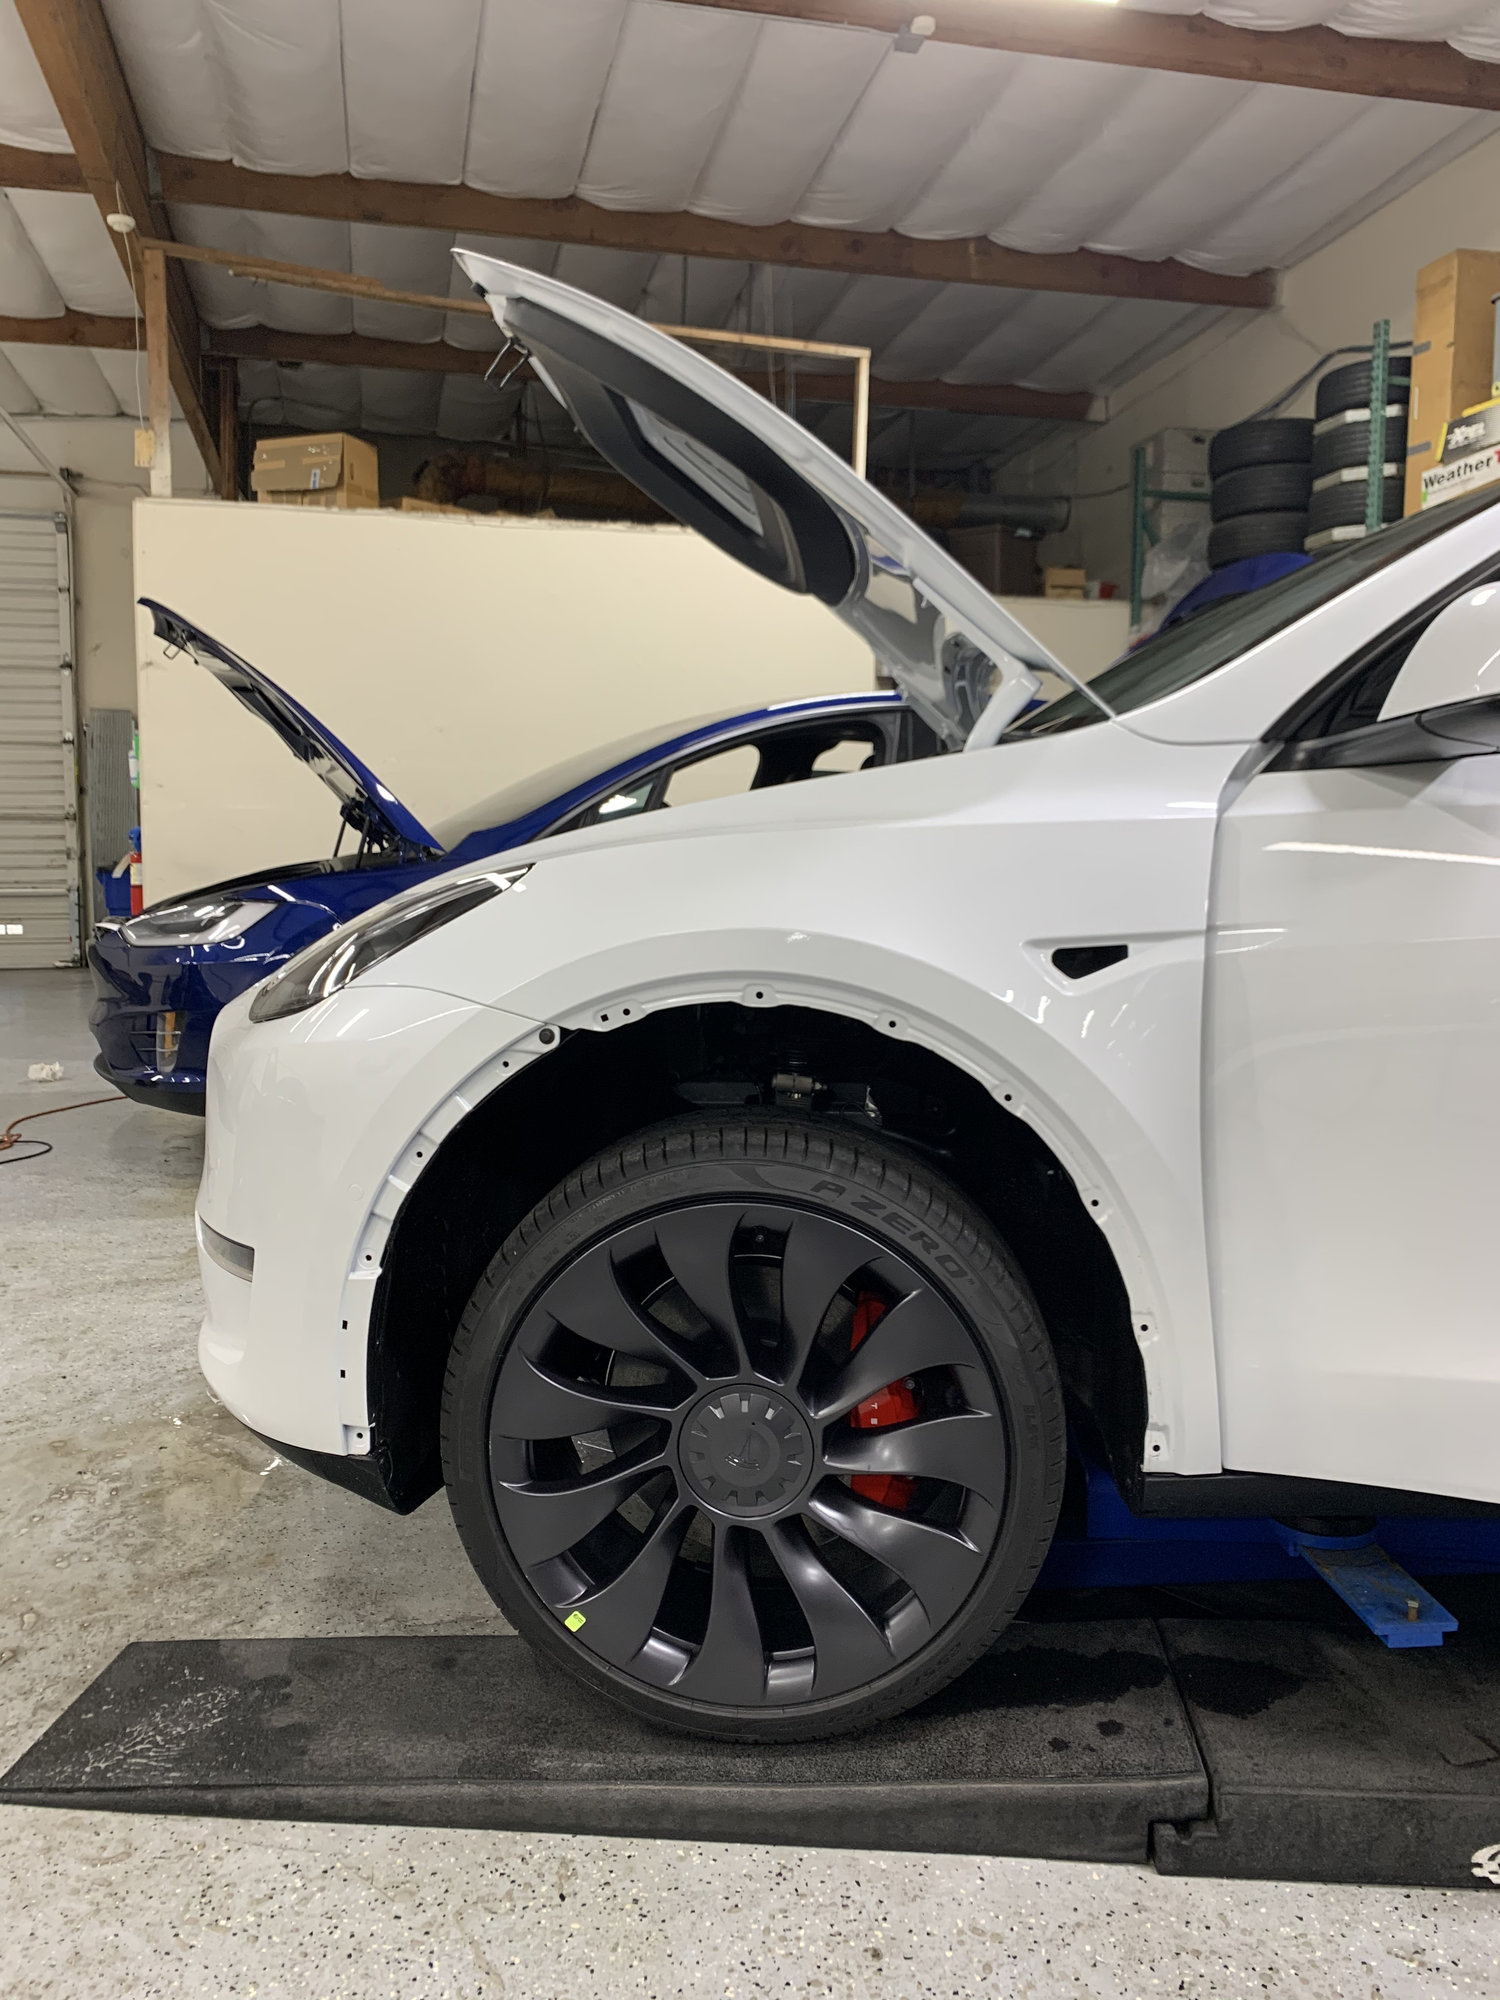 2020 Tesla Model Y Pearl White Multi-Coat  (Appearance Solutions-Sacramento,CA)~11.jpeg